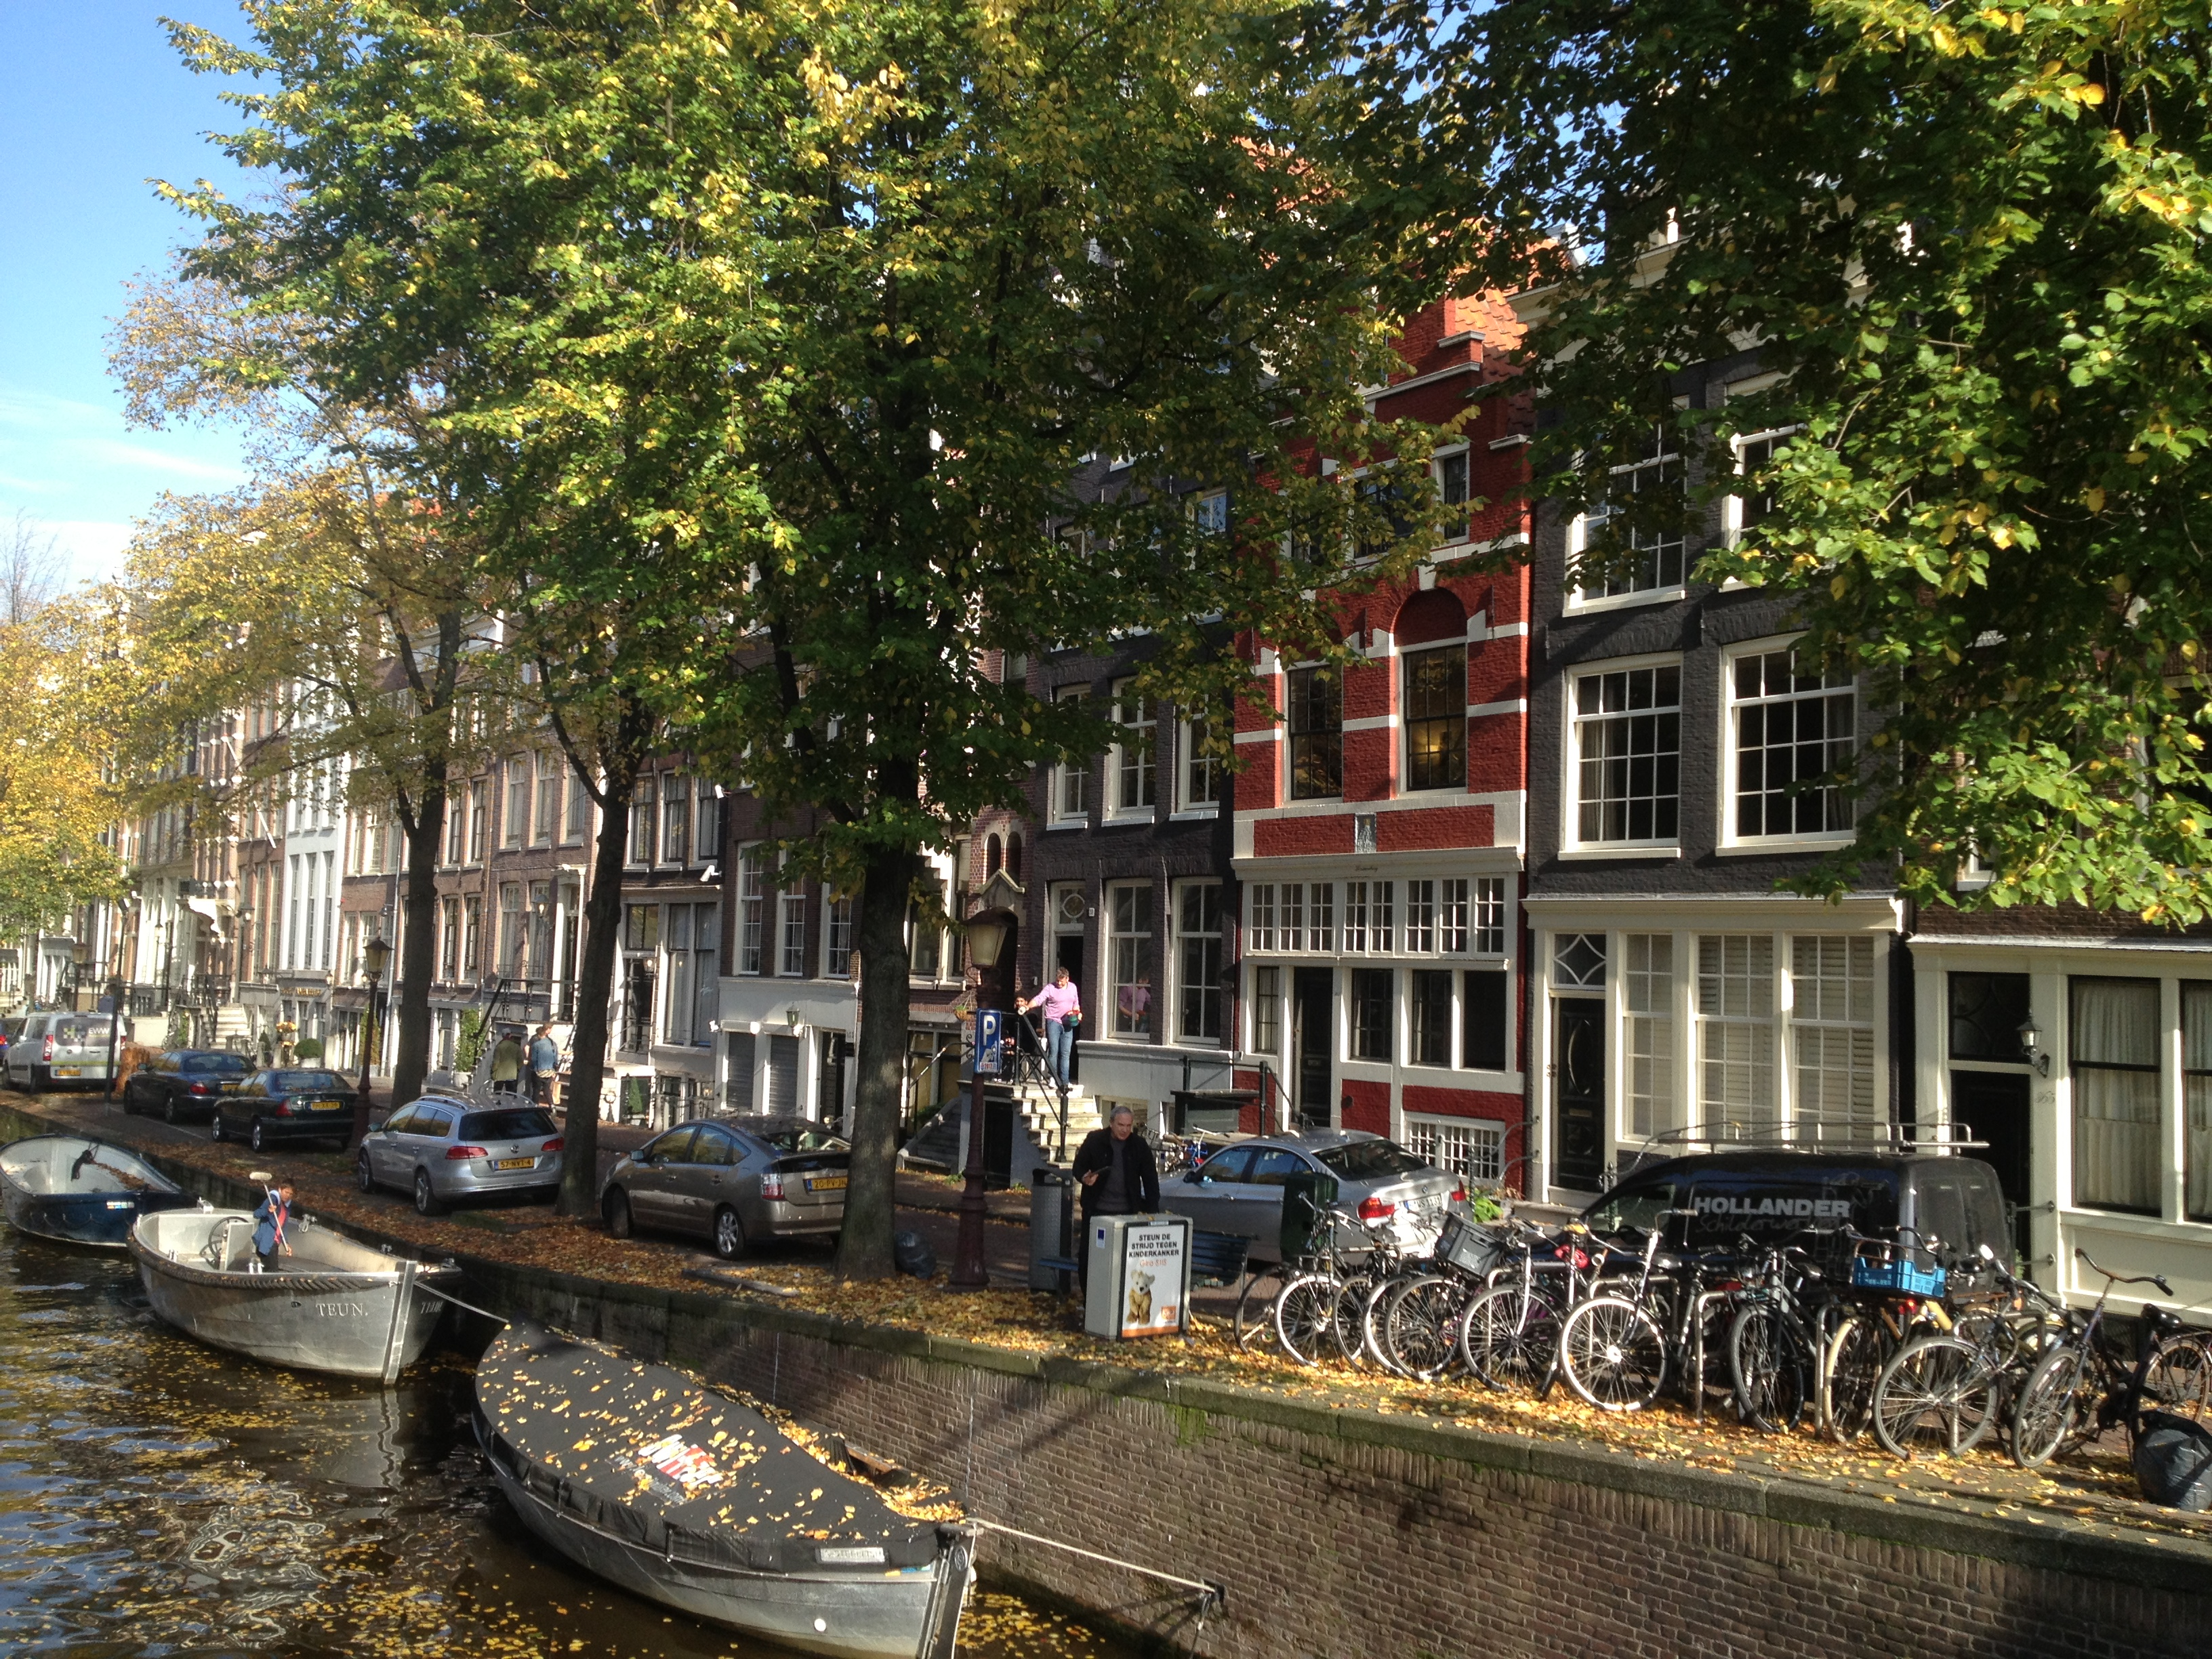 Sonnenberg on Herengracht Canal